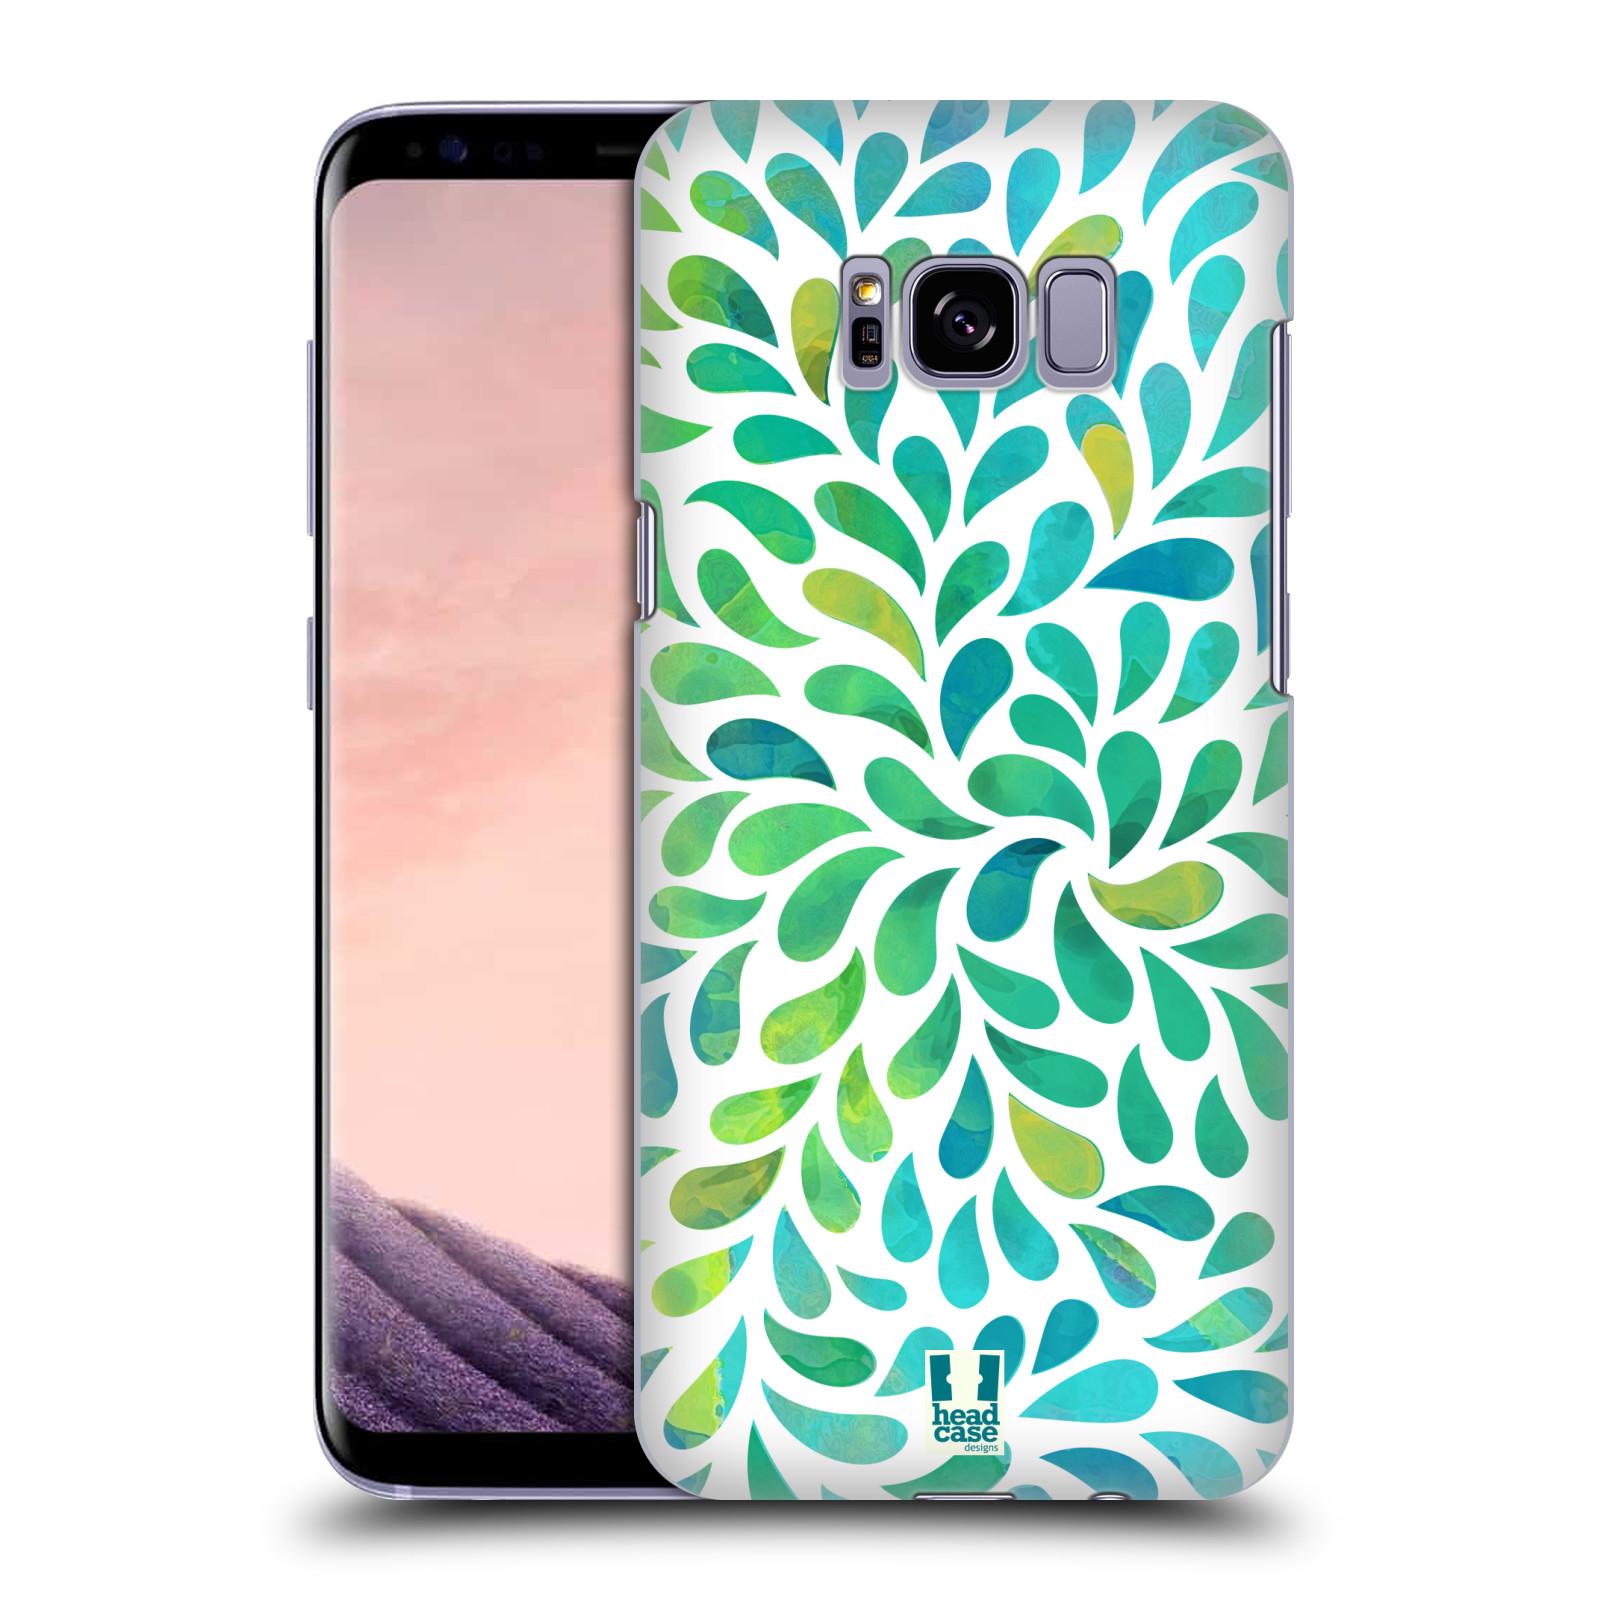 Plastové pouzdro na mobil Samsung Galaxy S8+ (Plus) Head Case Droplet Wave Kapičky (Plastový kryt či obal na mobilní telefon Samsung Galaxy S8+ (Plus) SM-G9550)